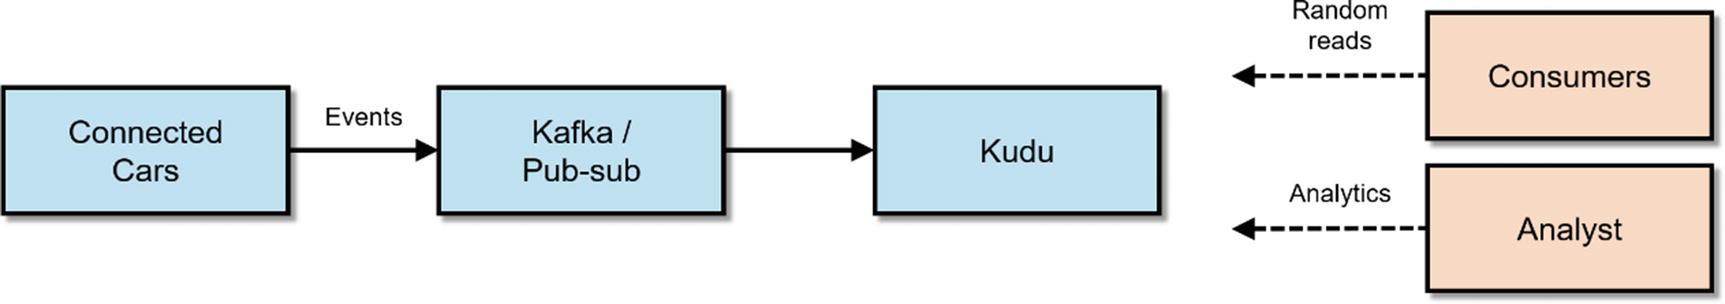 Introduction to Kudu | SpringerLink